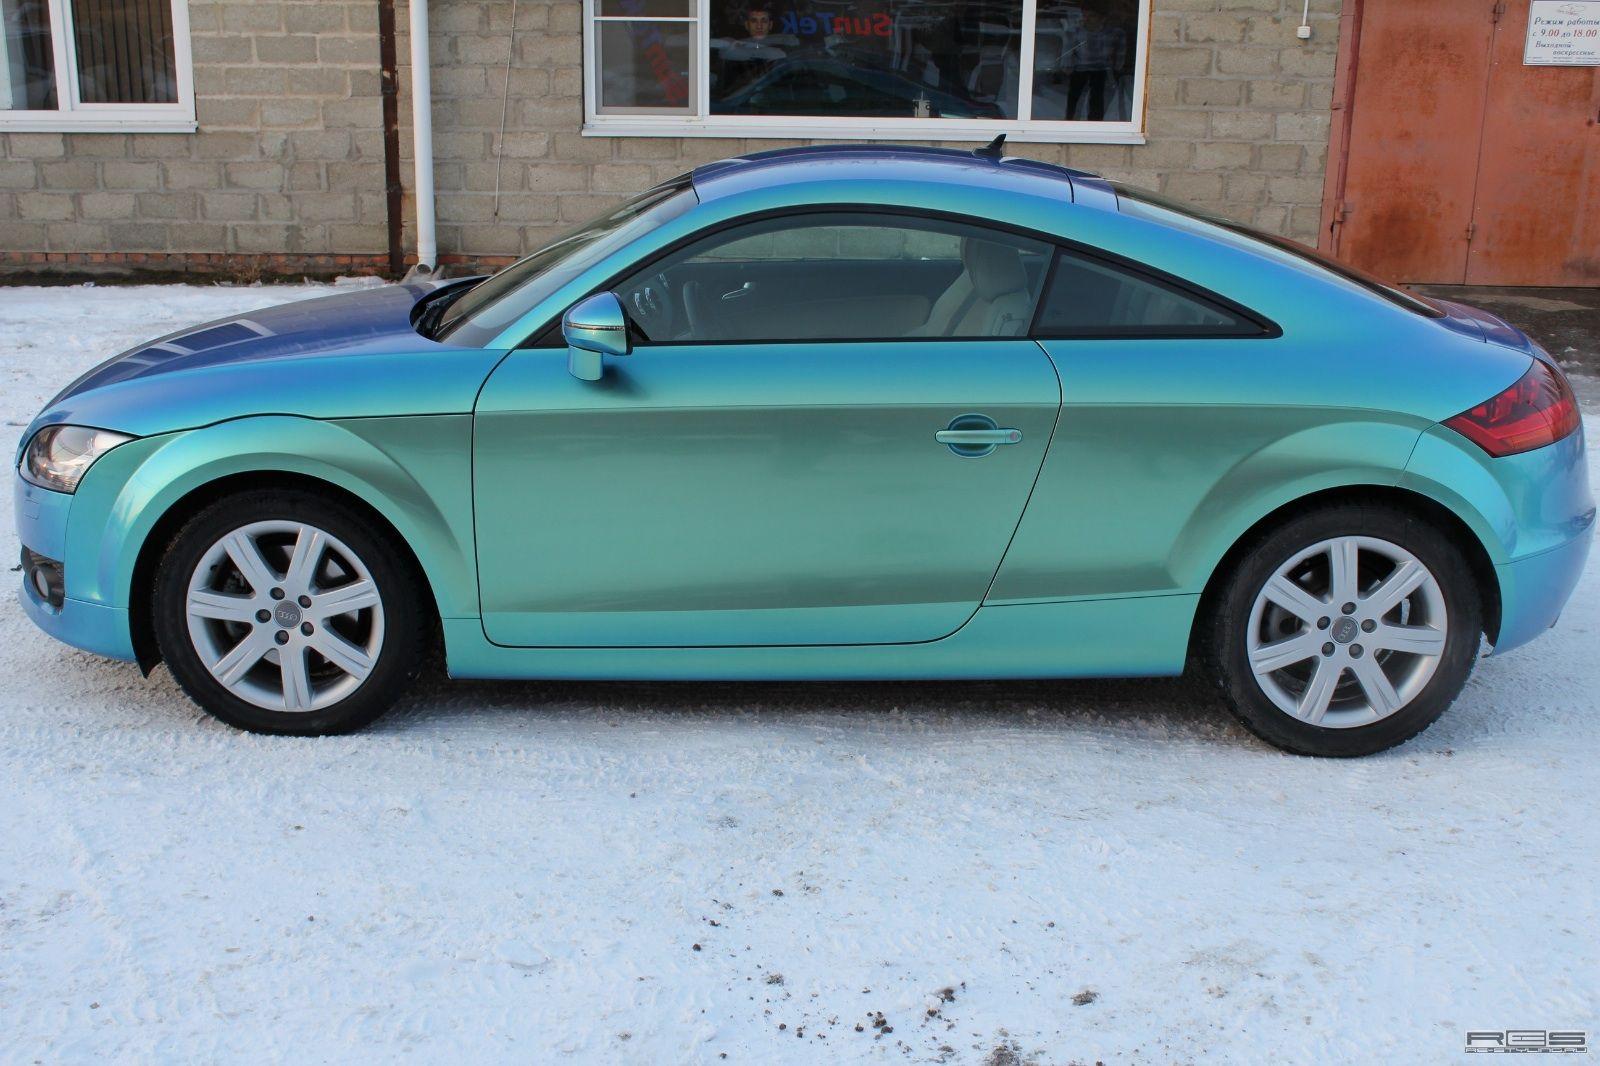 BlueGreen Chameleon Audi TT (con immagini)